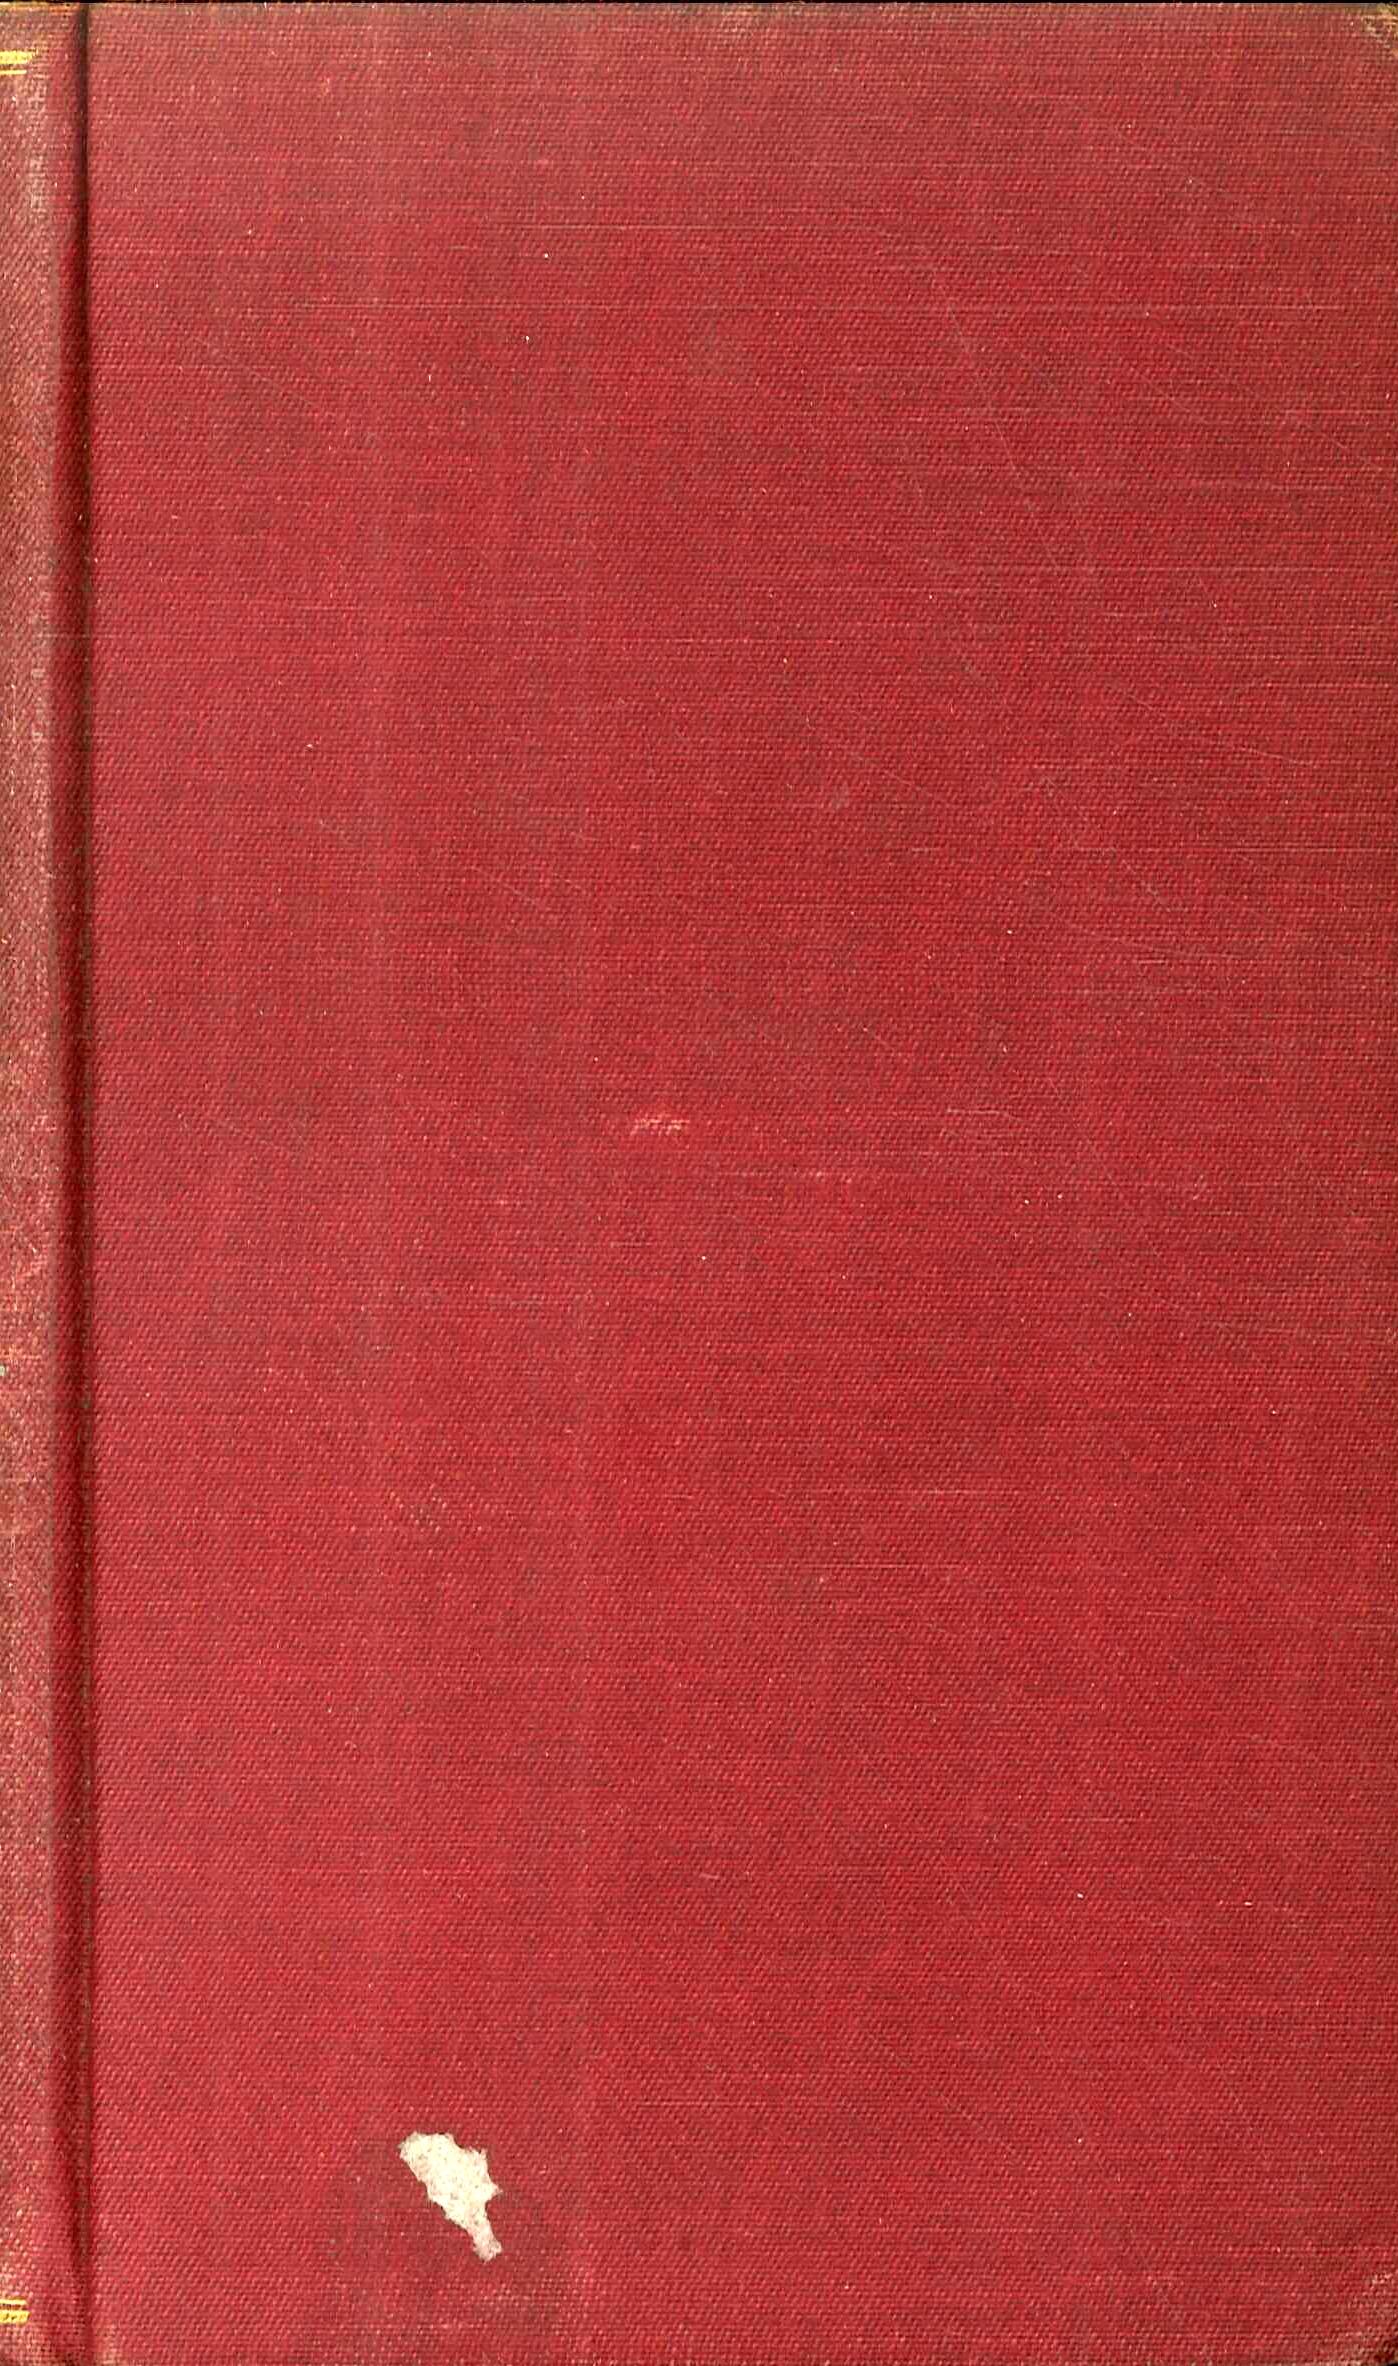 Carteggi italiani inediti o rari. Antichi e moderni. Raccolti ed annotati da Filippo Orlando. Prima Serie. I. II. III